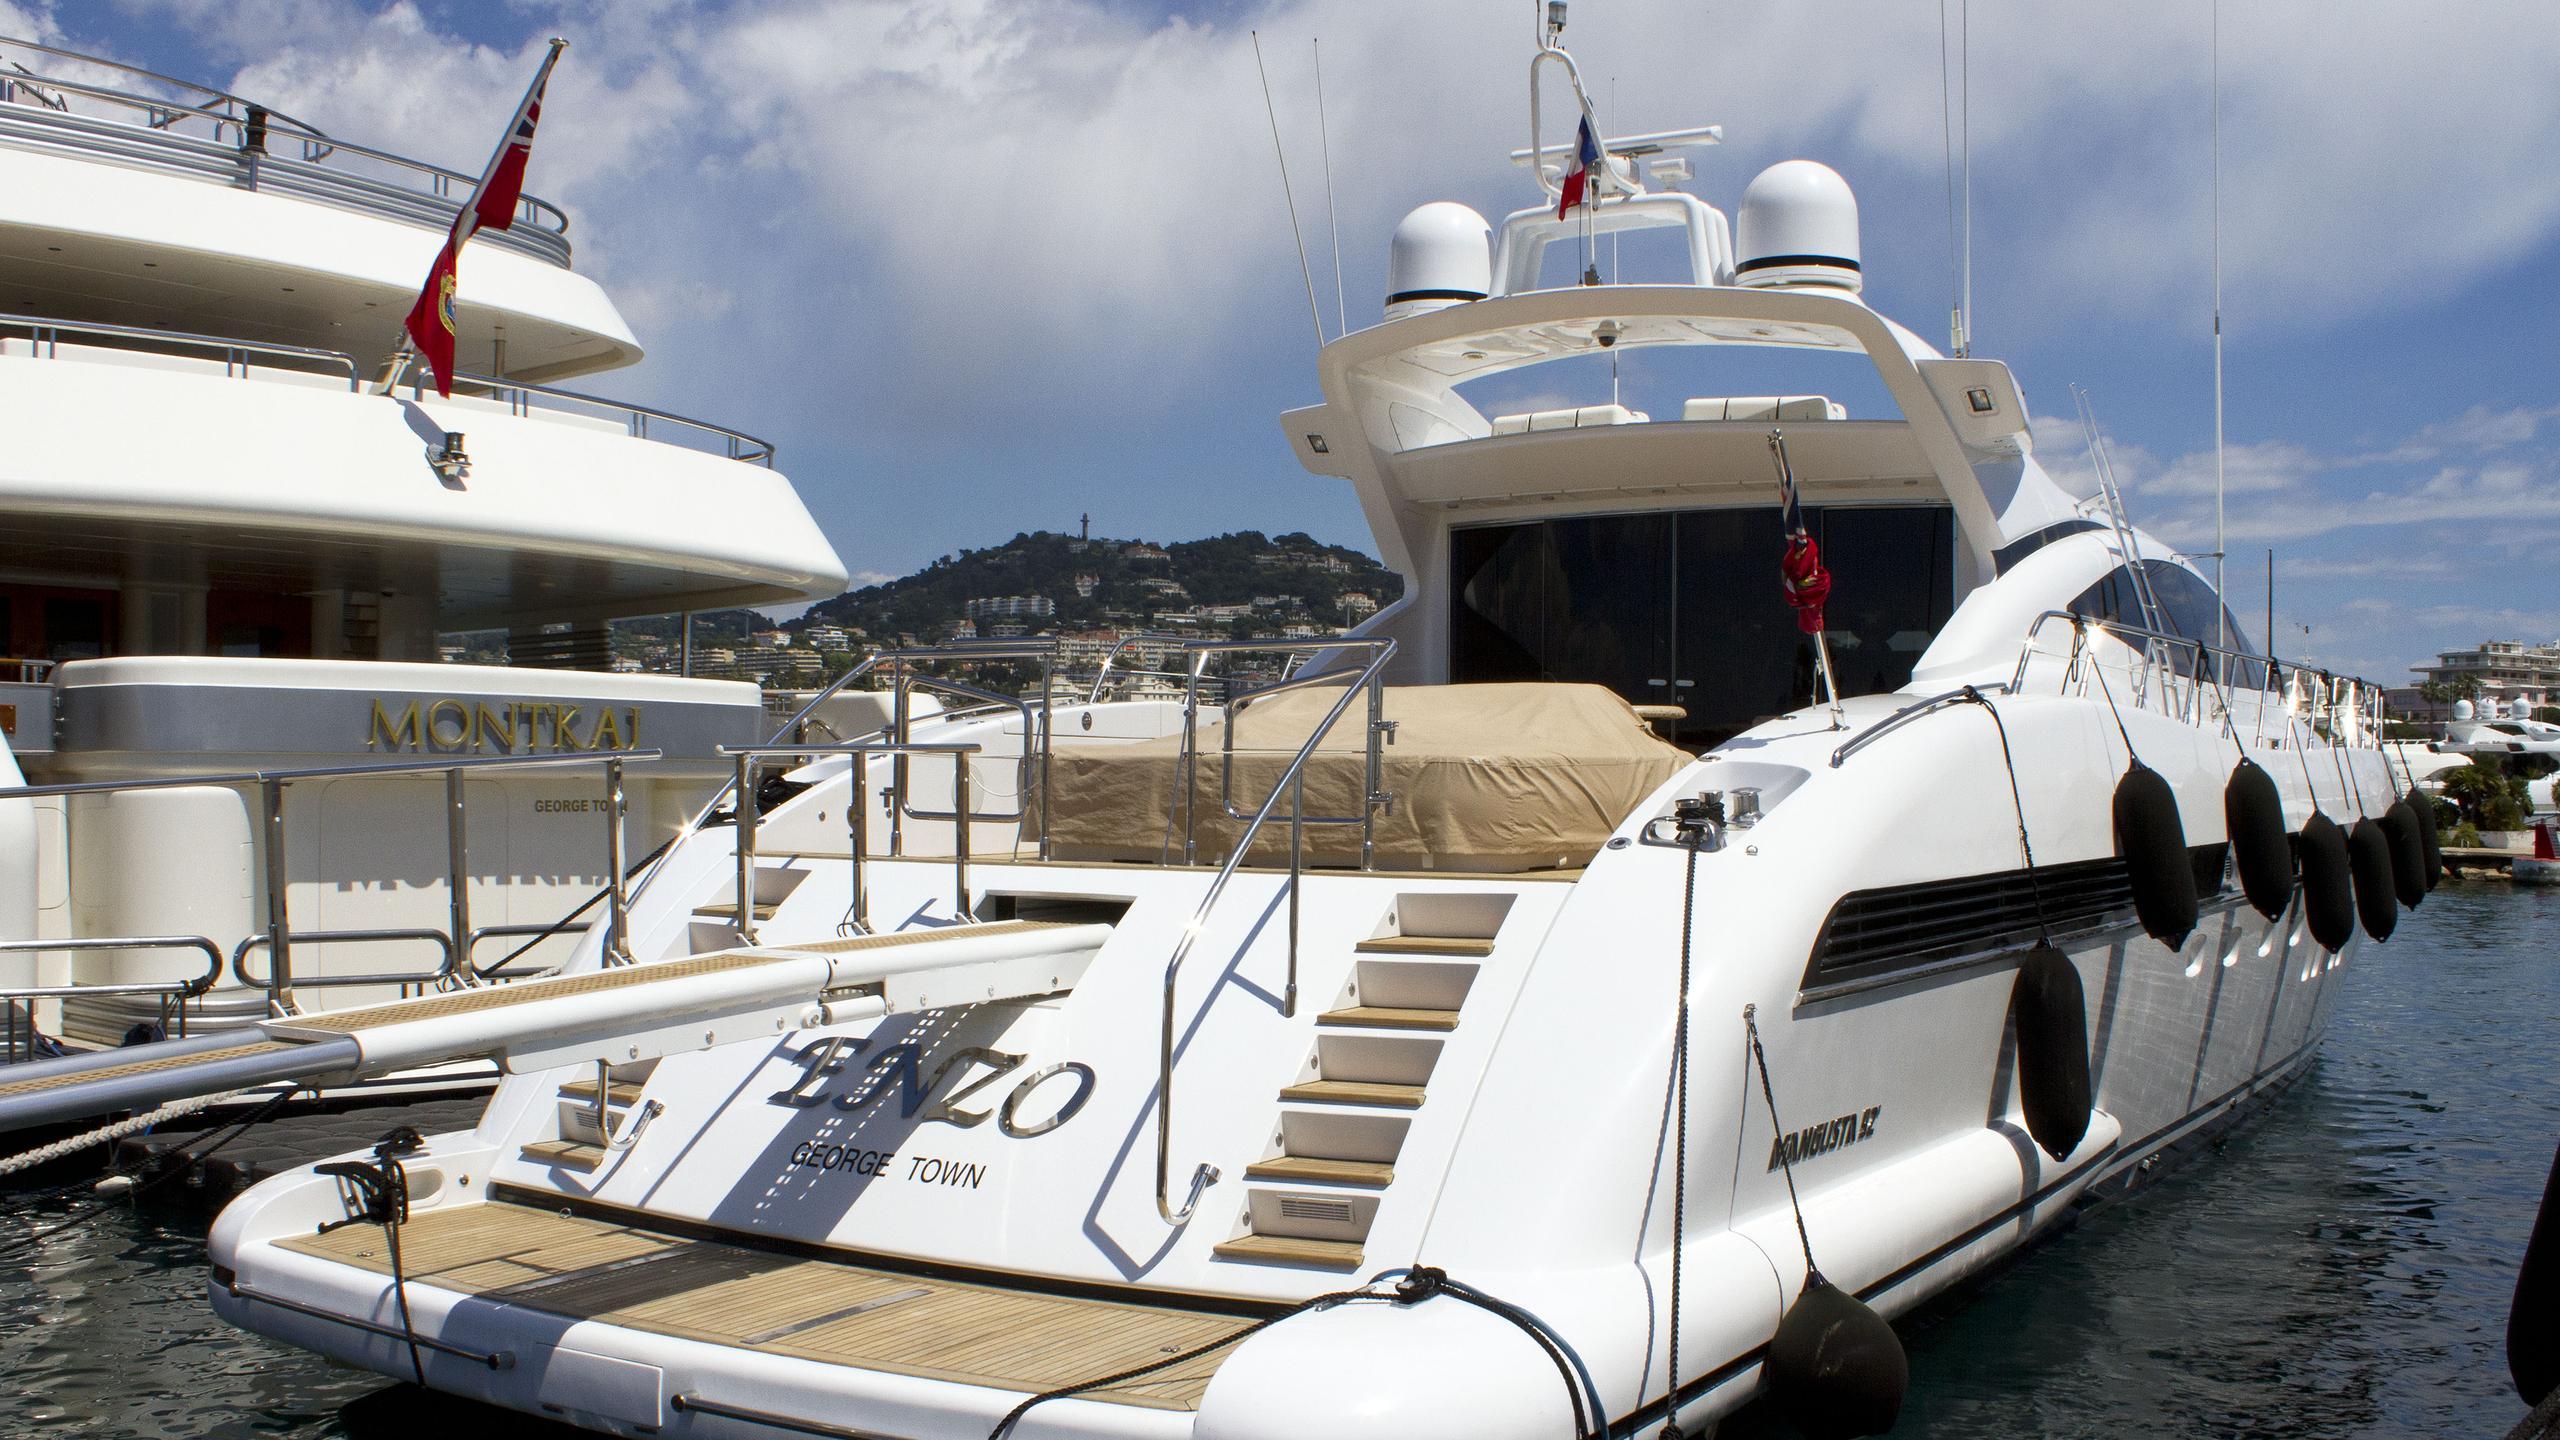 enzo-motor-yacht-mondomarine-mangusta-92-open-2005-28m-stern